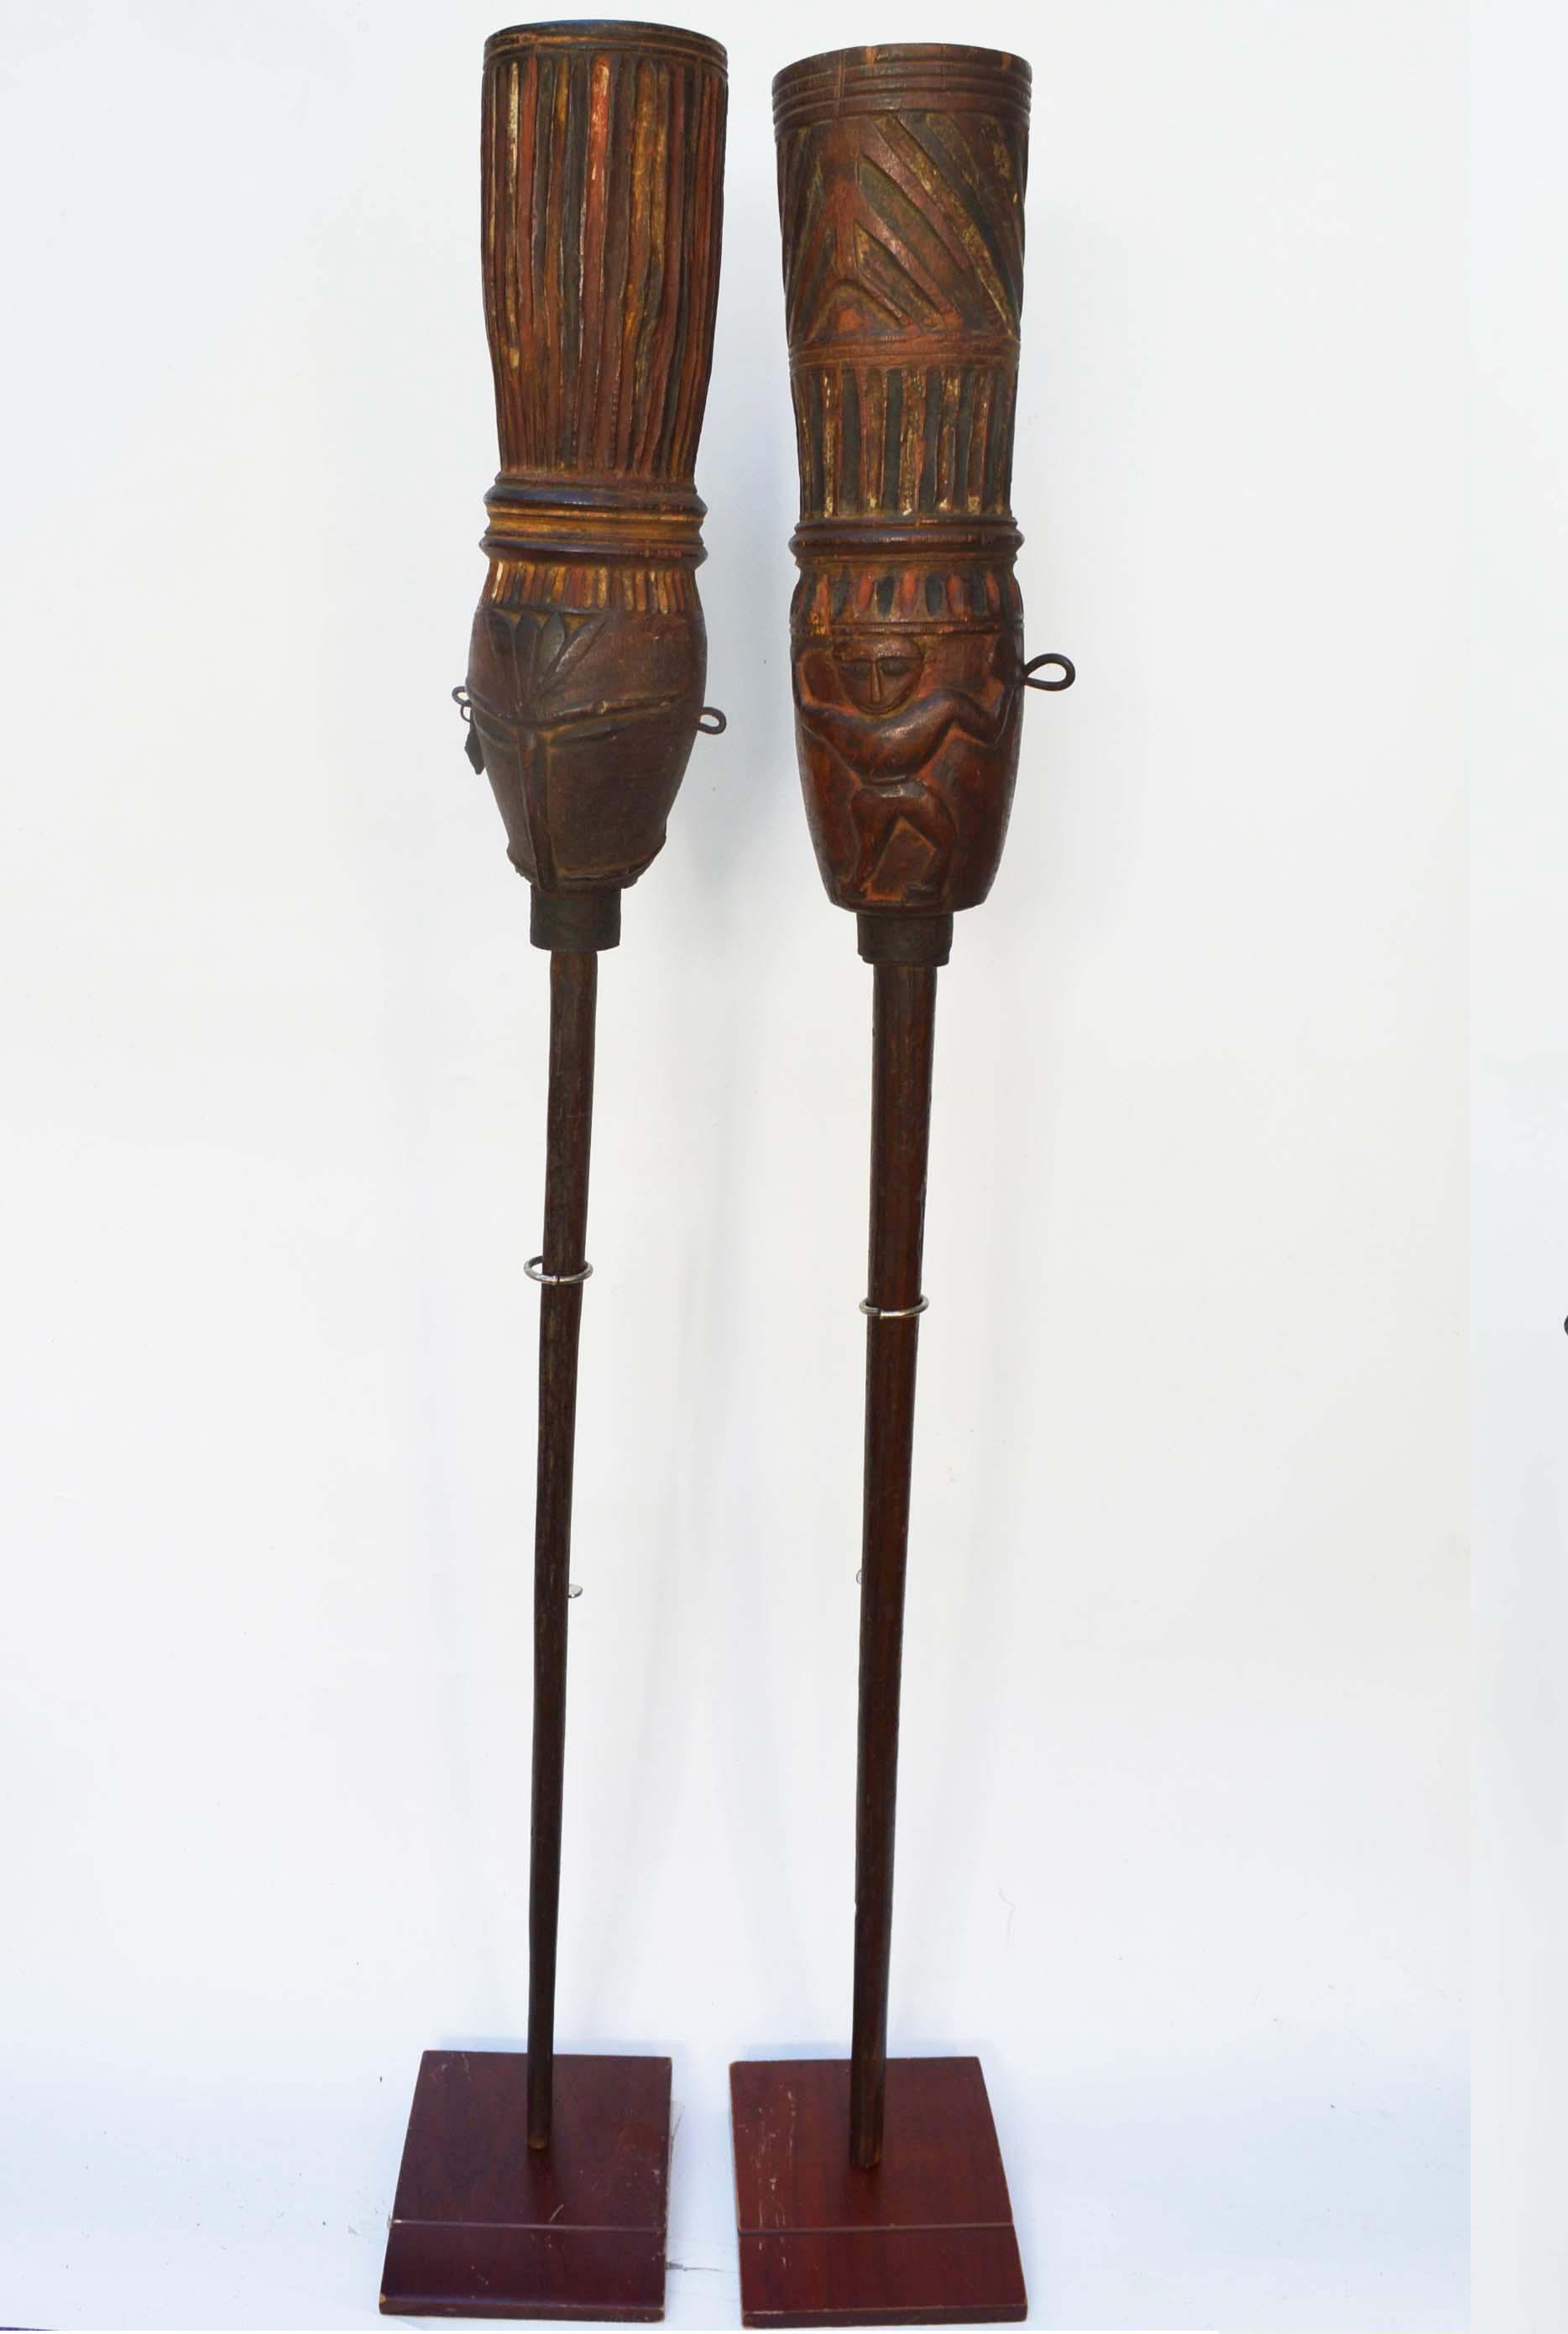 Fhagli festival ceremonial poles